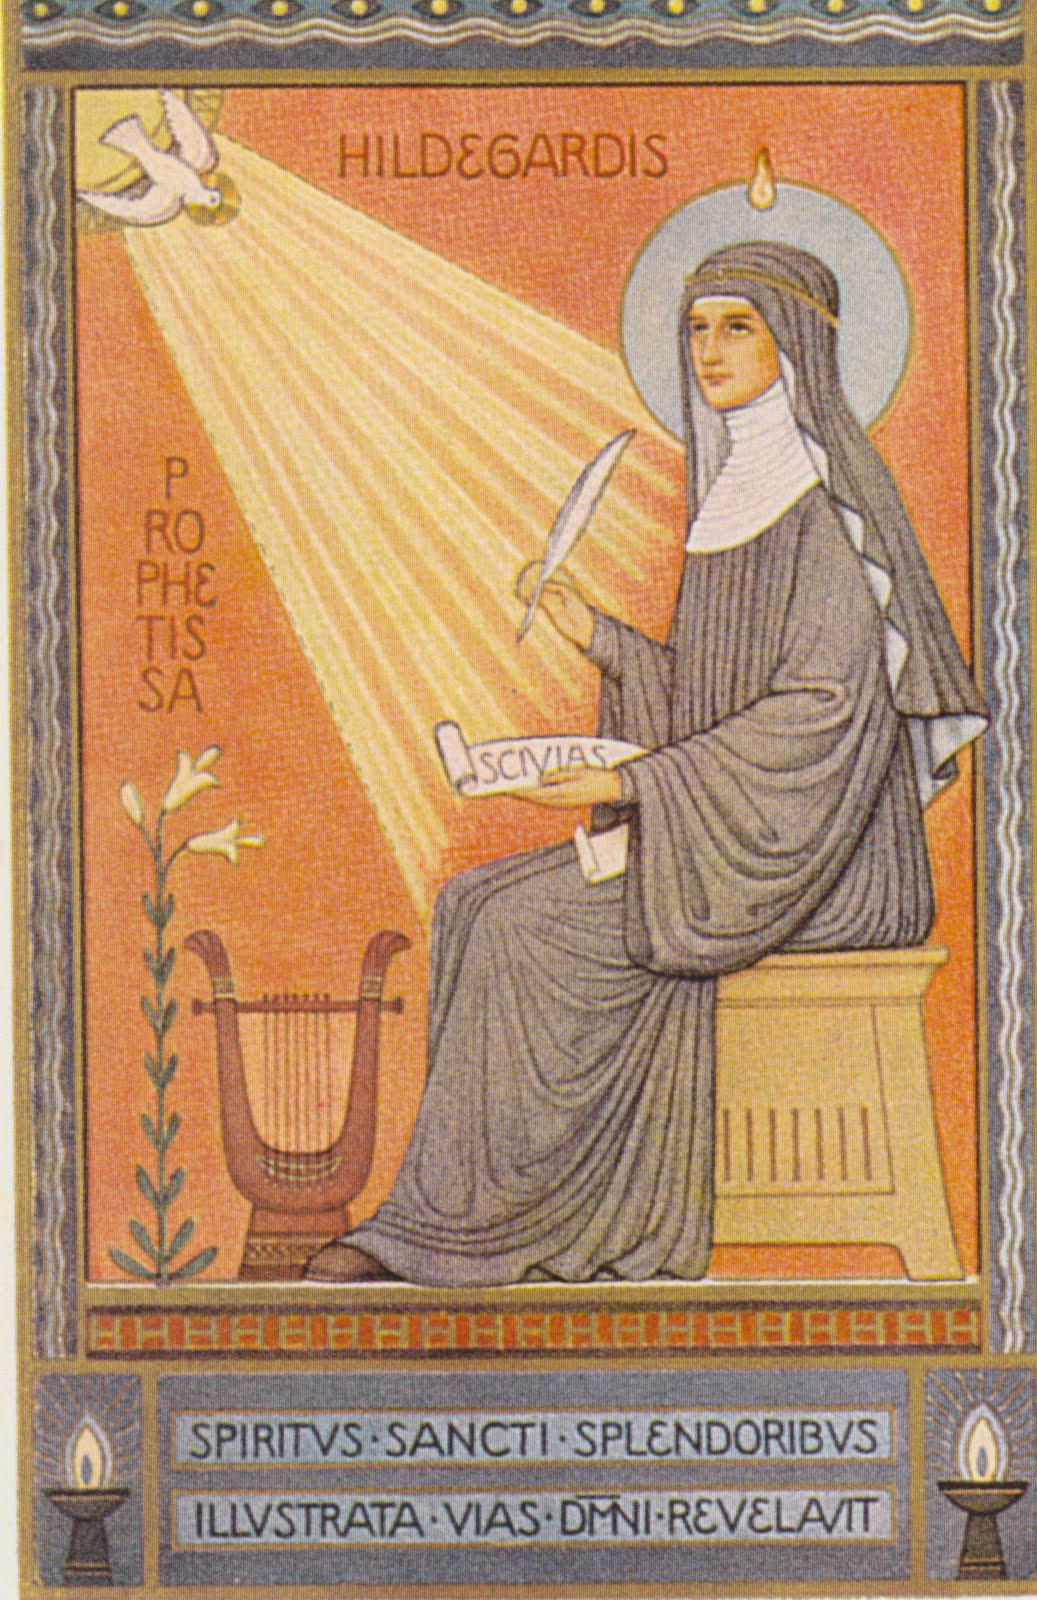 saint hildegard of bingen - gnostic muse